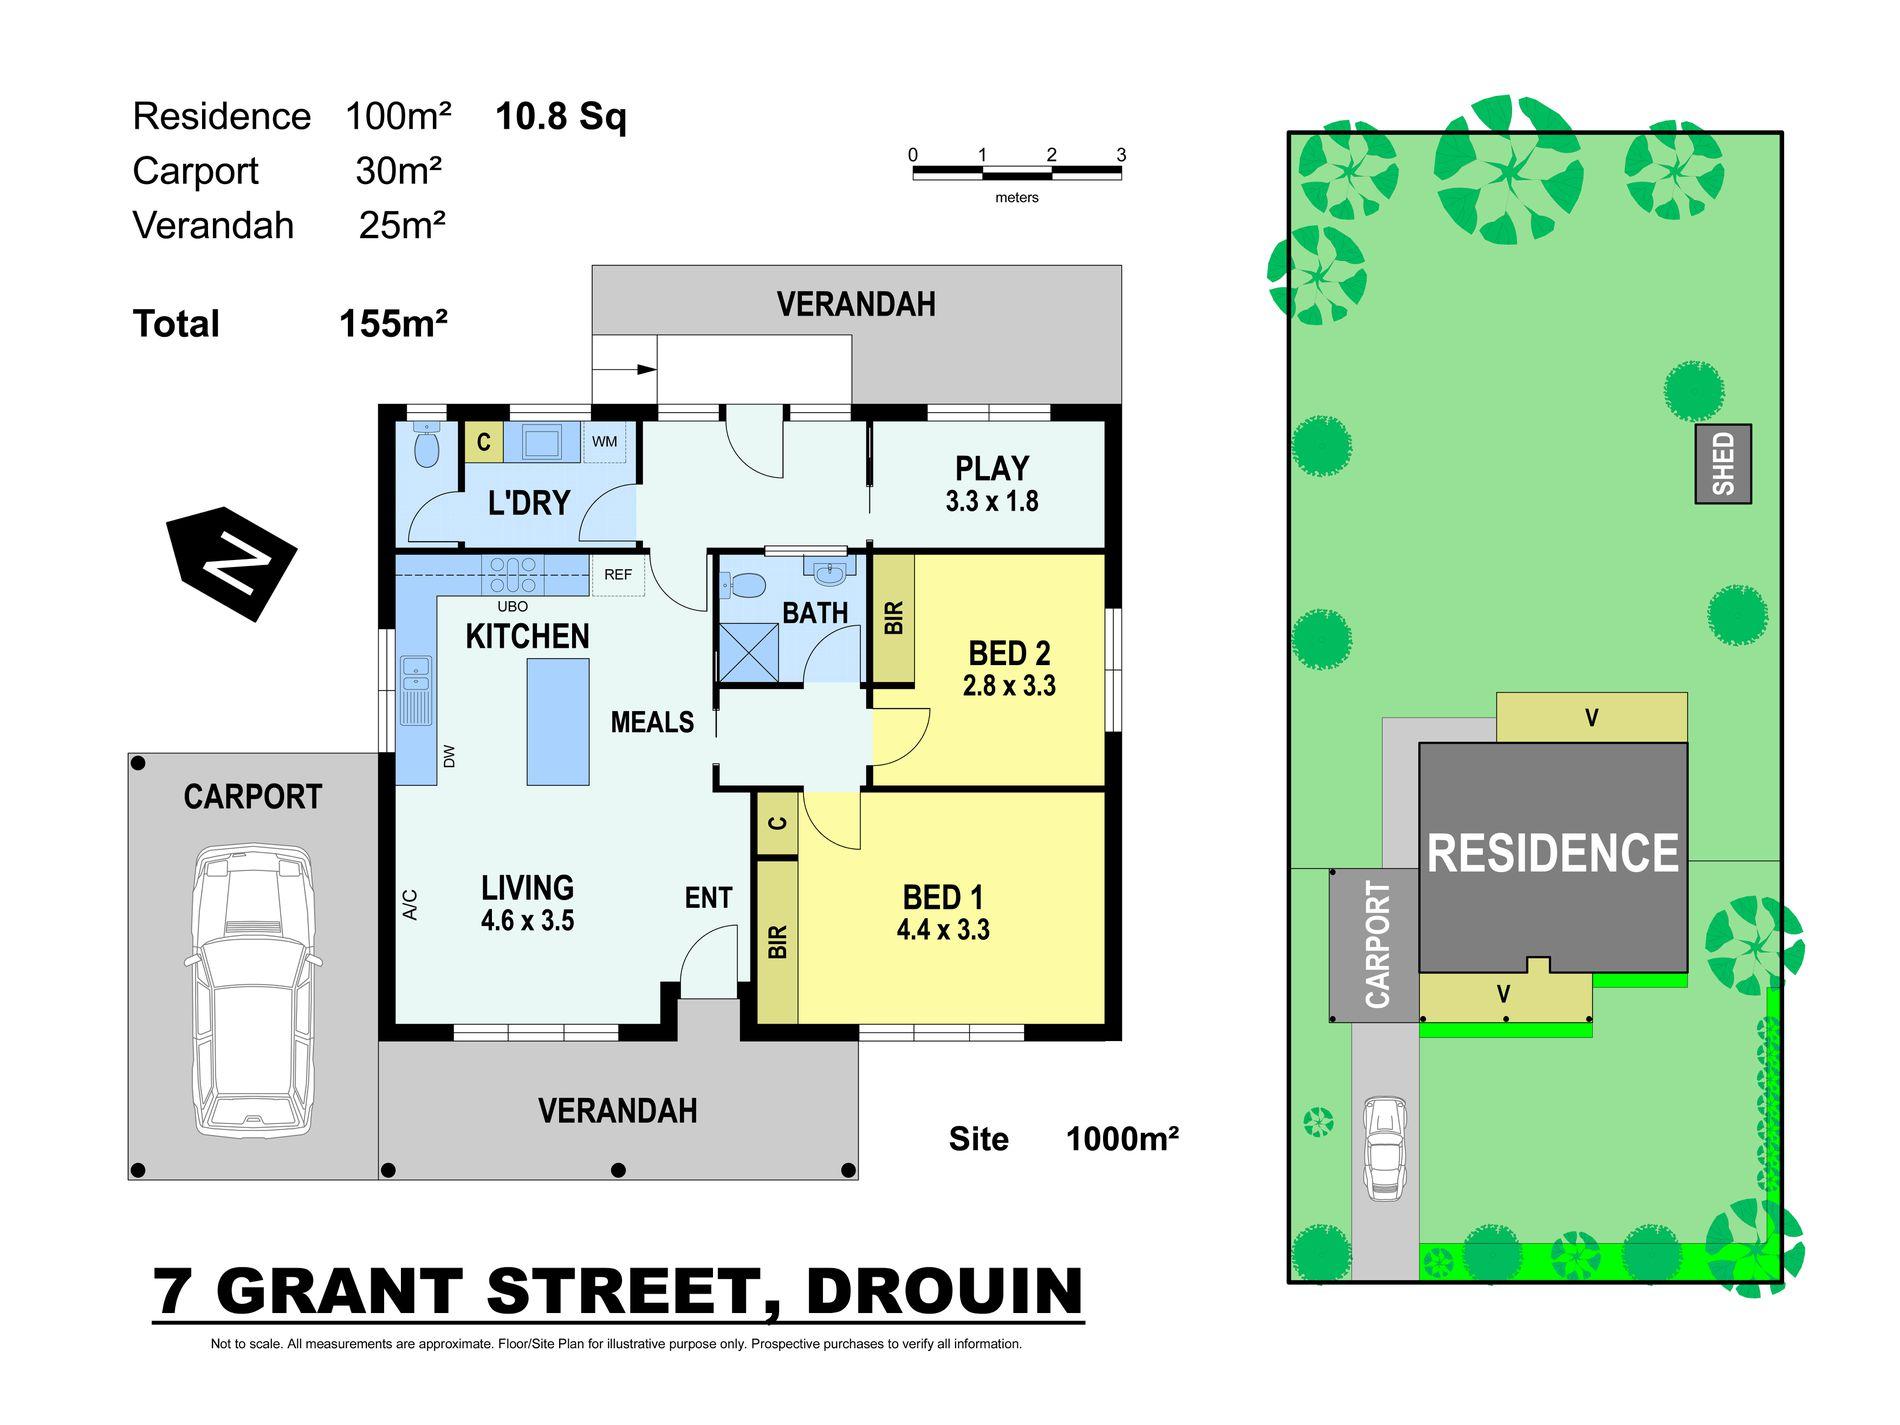 7 Grant Street, Drouin